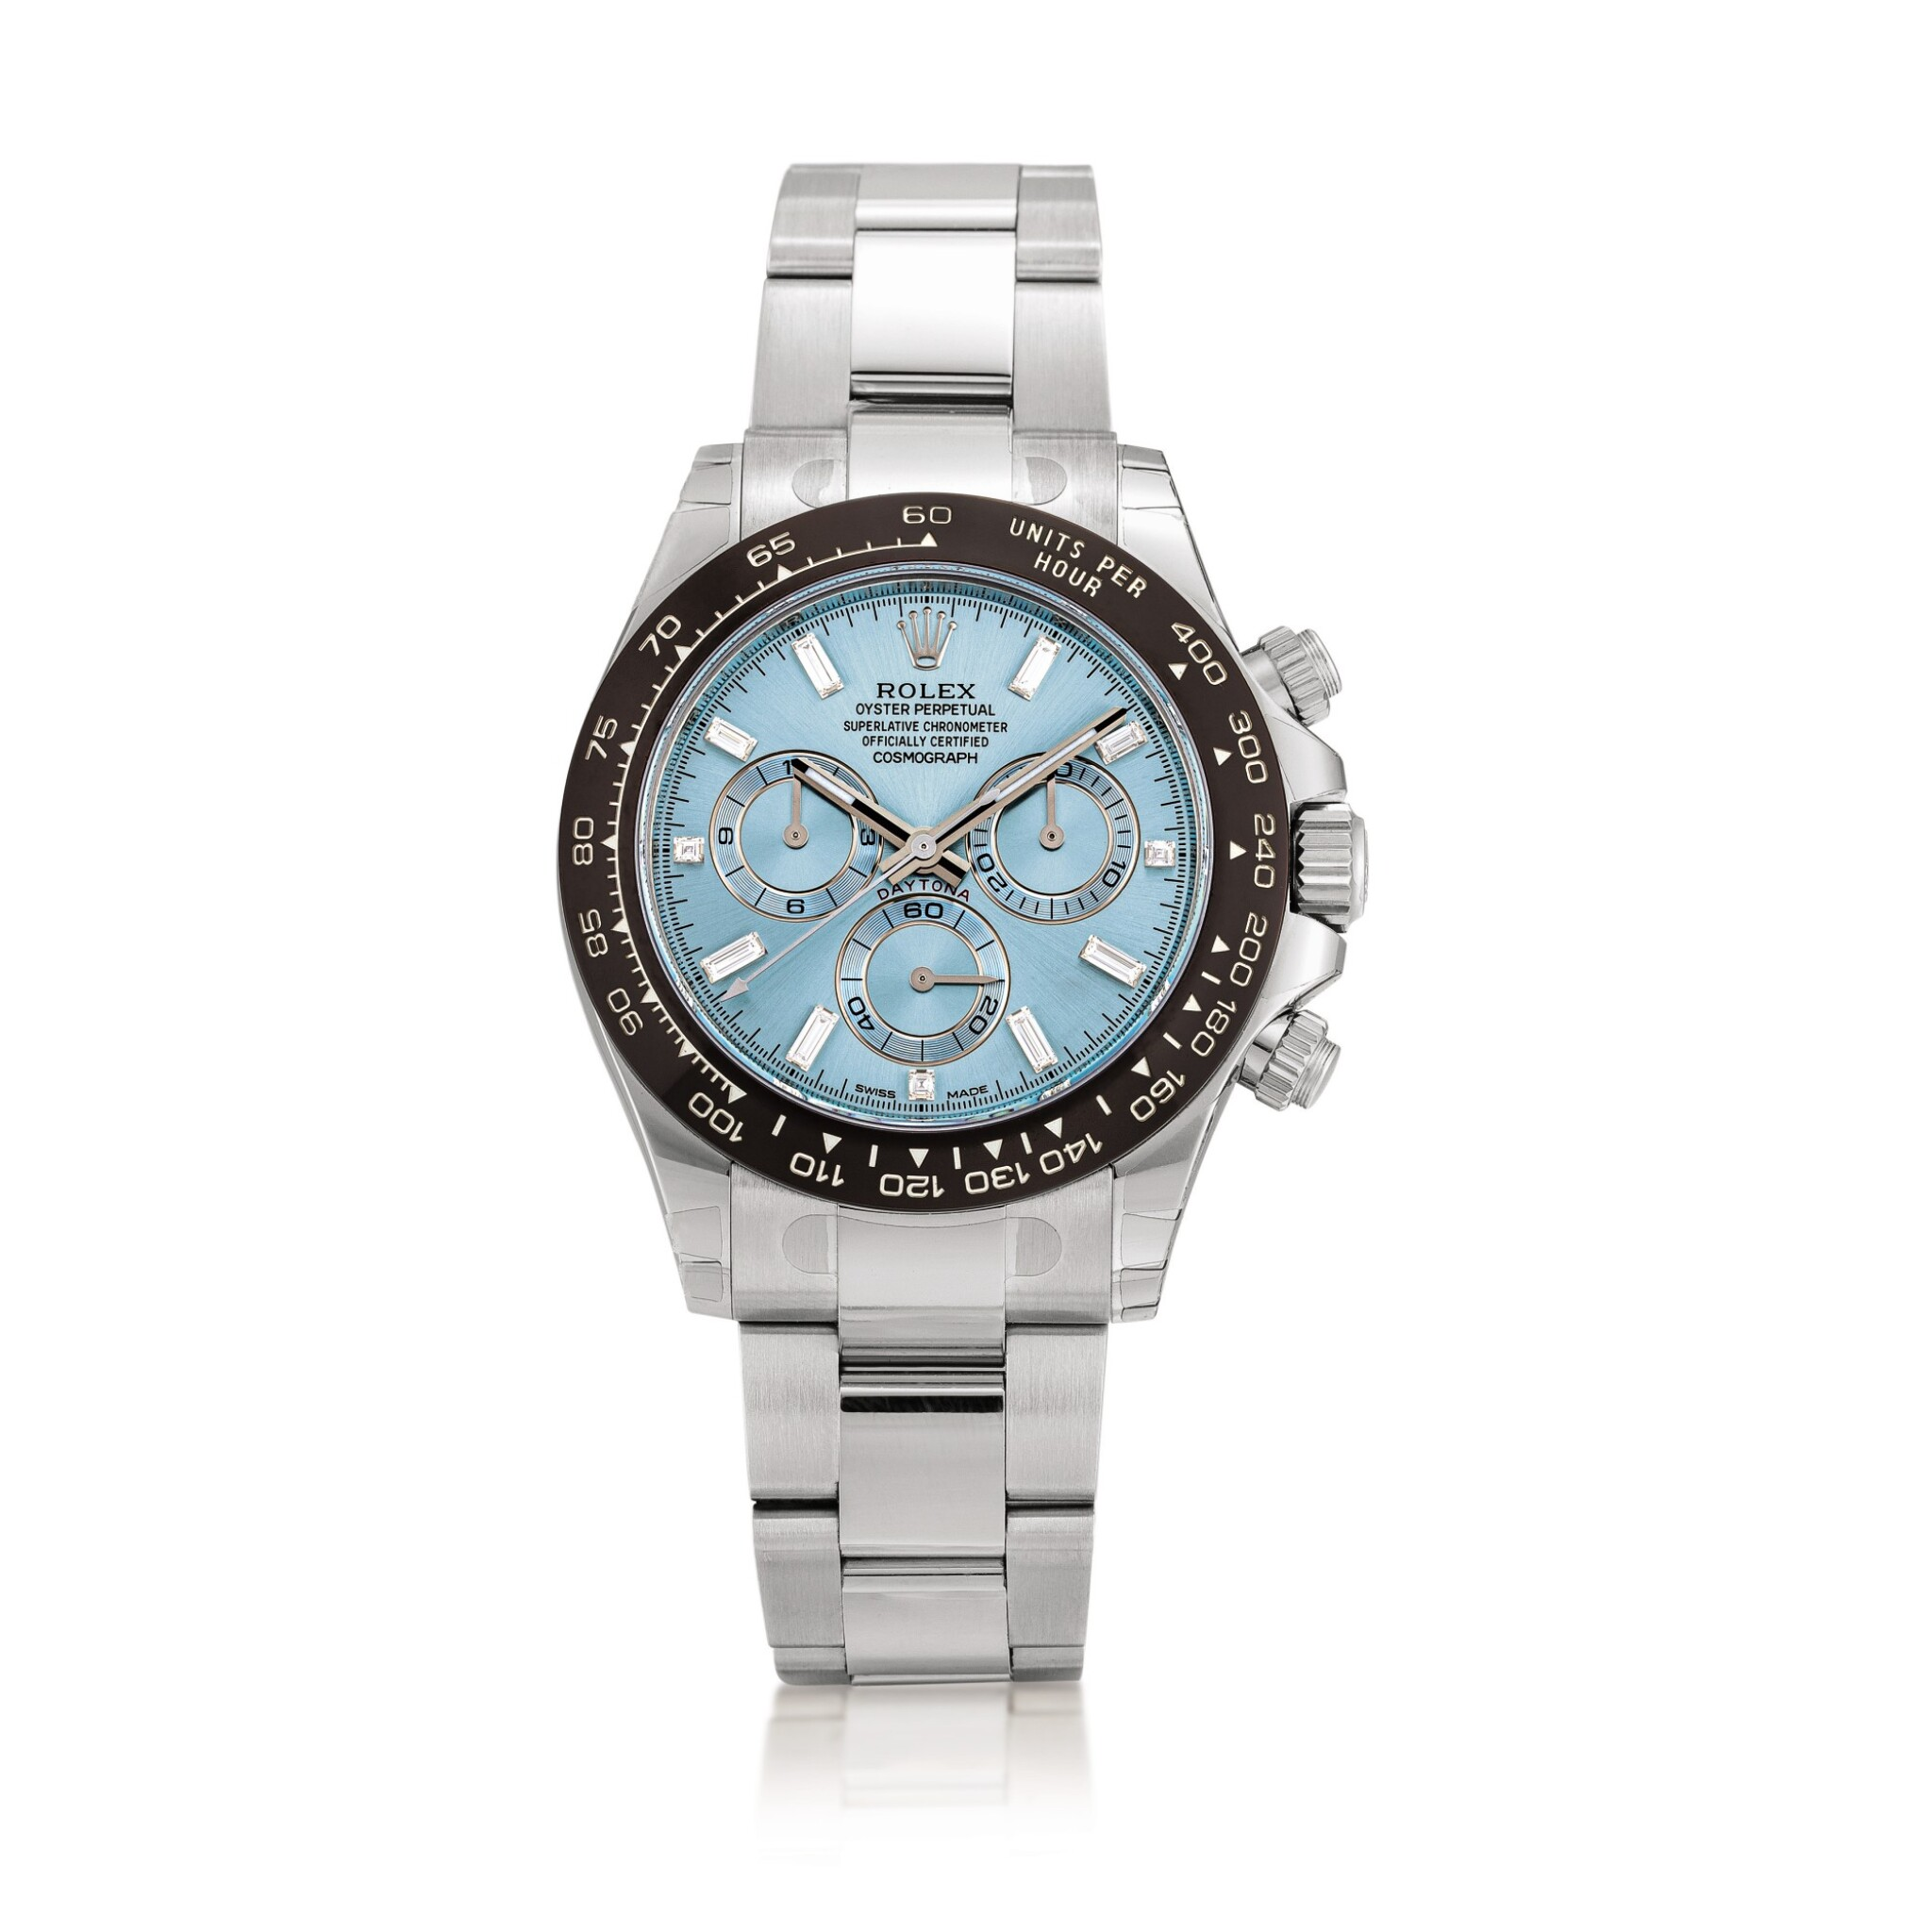 View full screen - View 1 of Lot 2015. Rolex   Cosmograph Daytona, Reference 116506, A brand new platinum and diamond-set chronograph wristwatch with bracelet, Circa 2020   勞力士   Cosmograph Daytona 型號116506 全新鉑金鑲鑽石計時鏈帶腕錶,約2020年製.